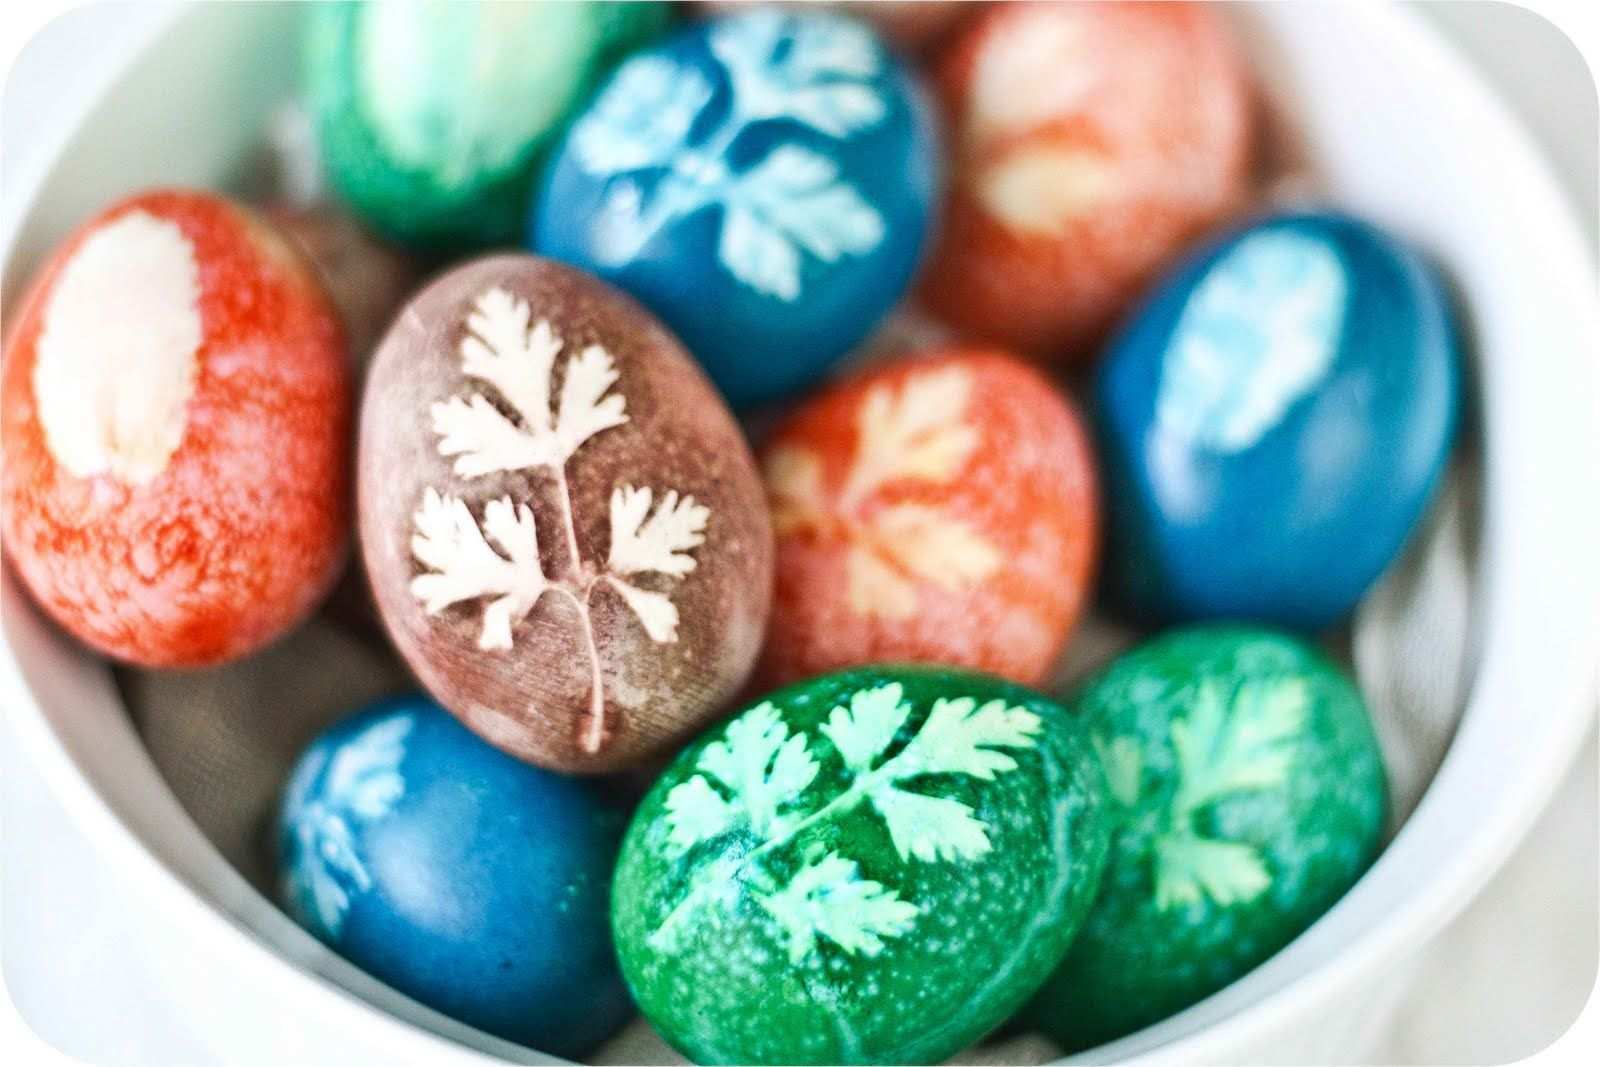 Gorgeous 3 Huevos De Pascua Huevos Decorados Manualidades